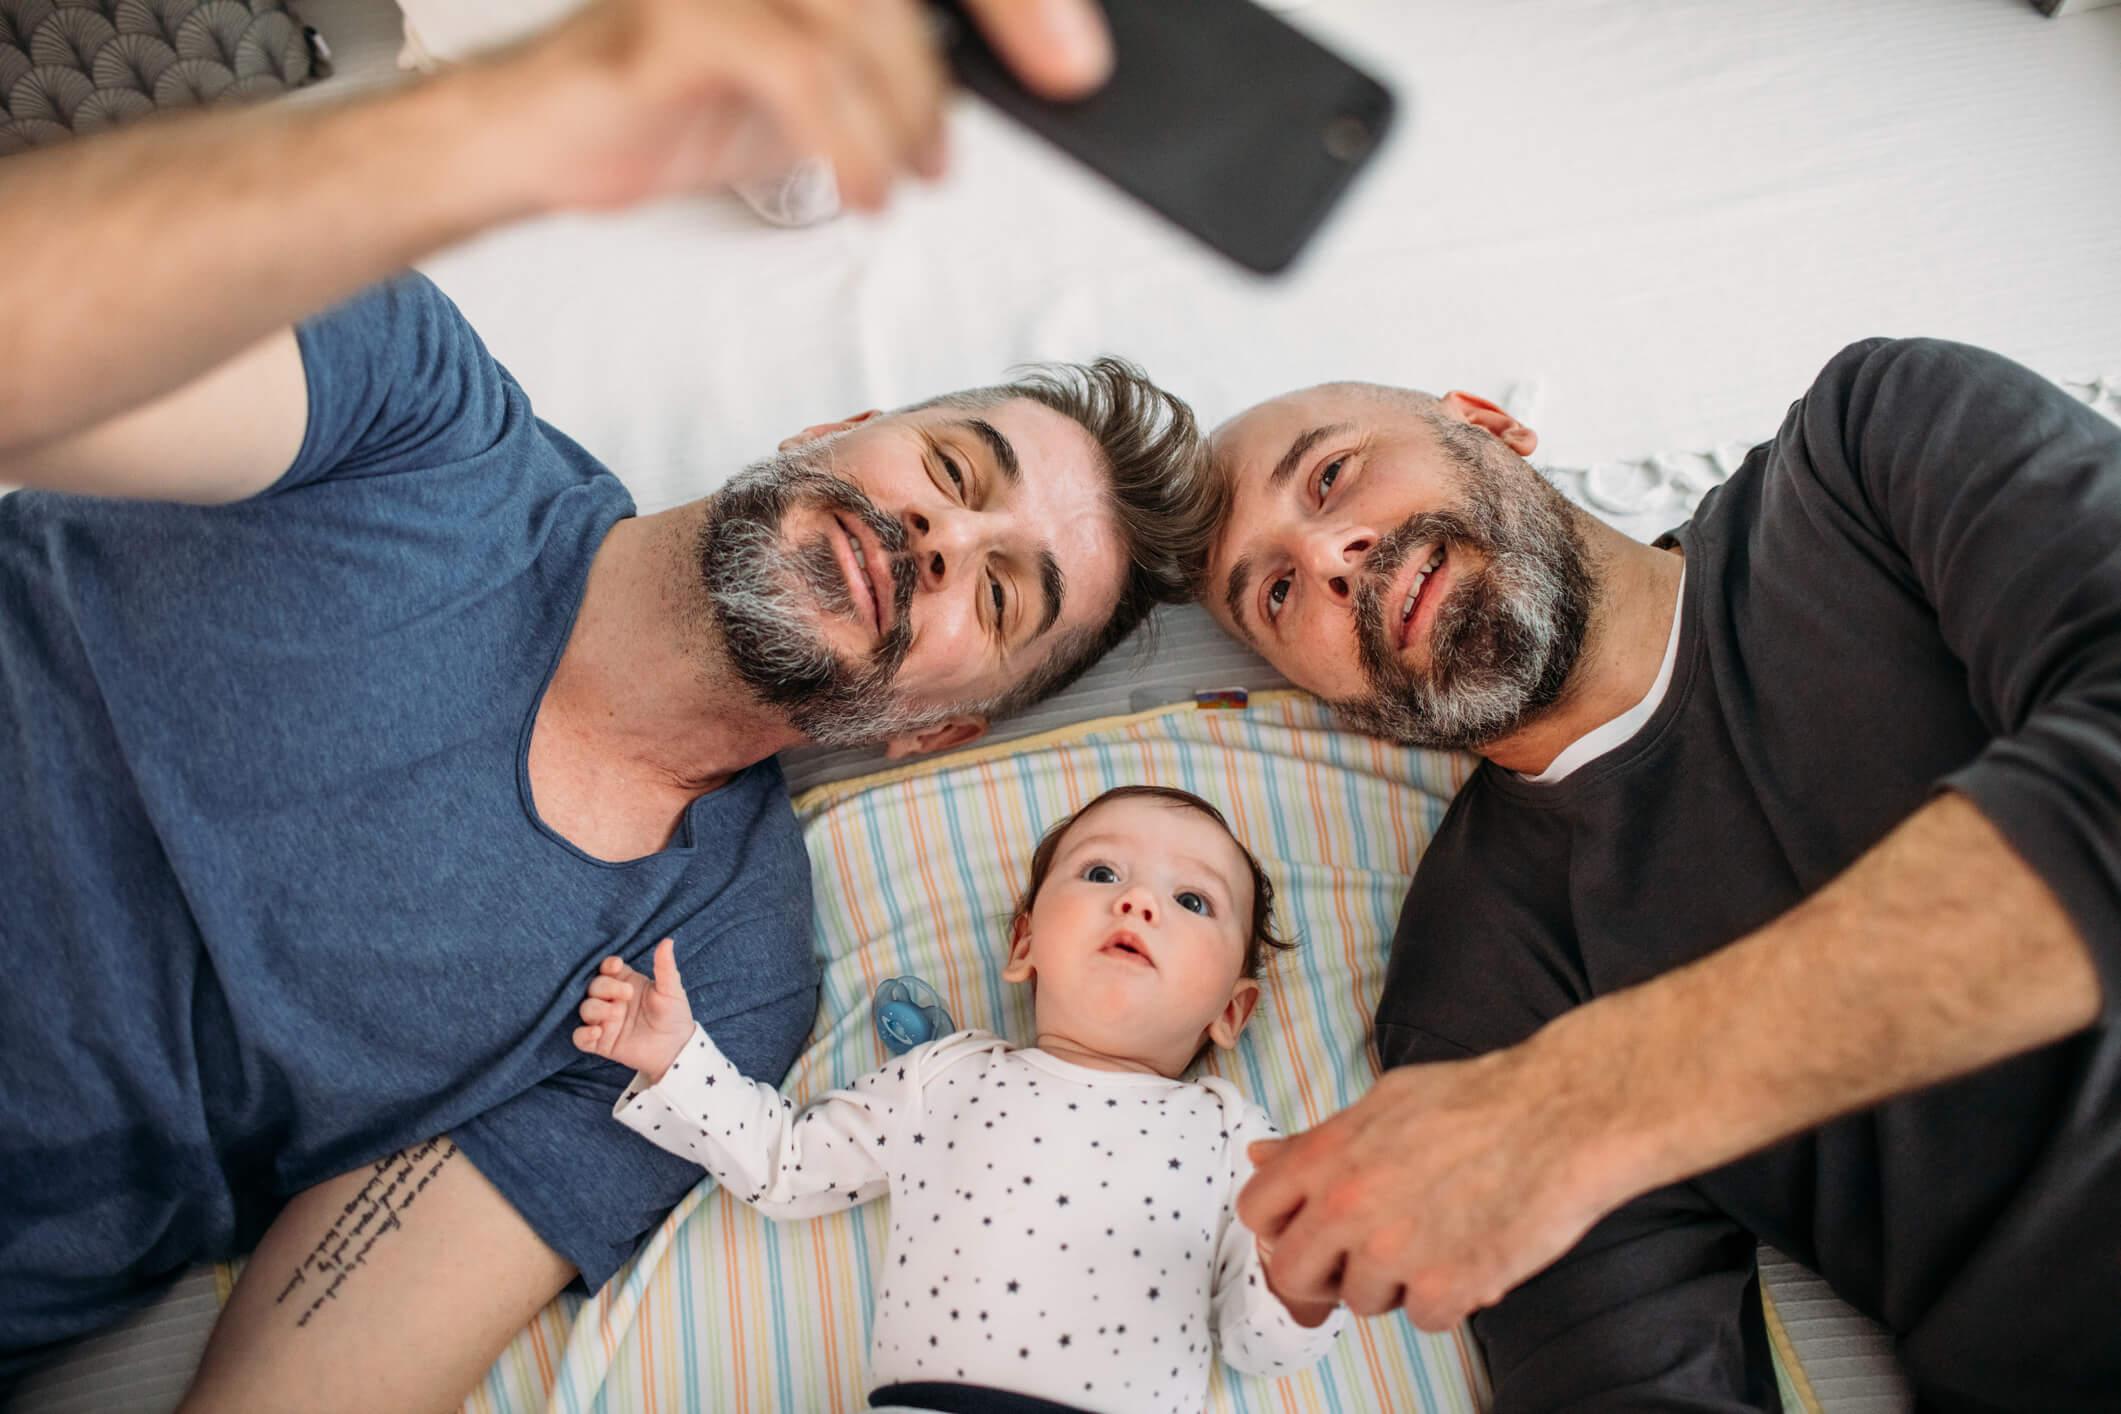 Projeto de lei garante registro de dupla maternidade ou paternidade a casais homoafetivos